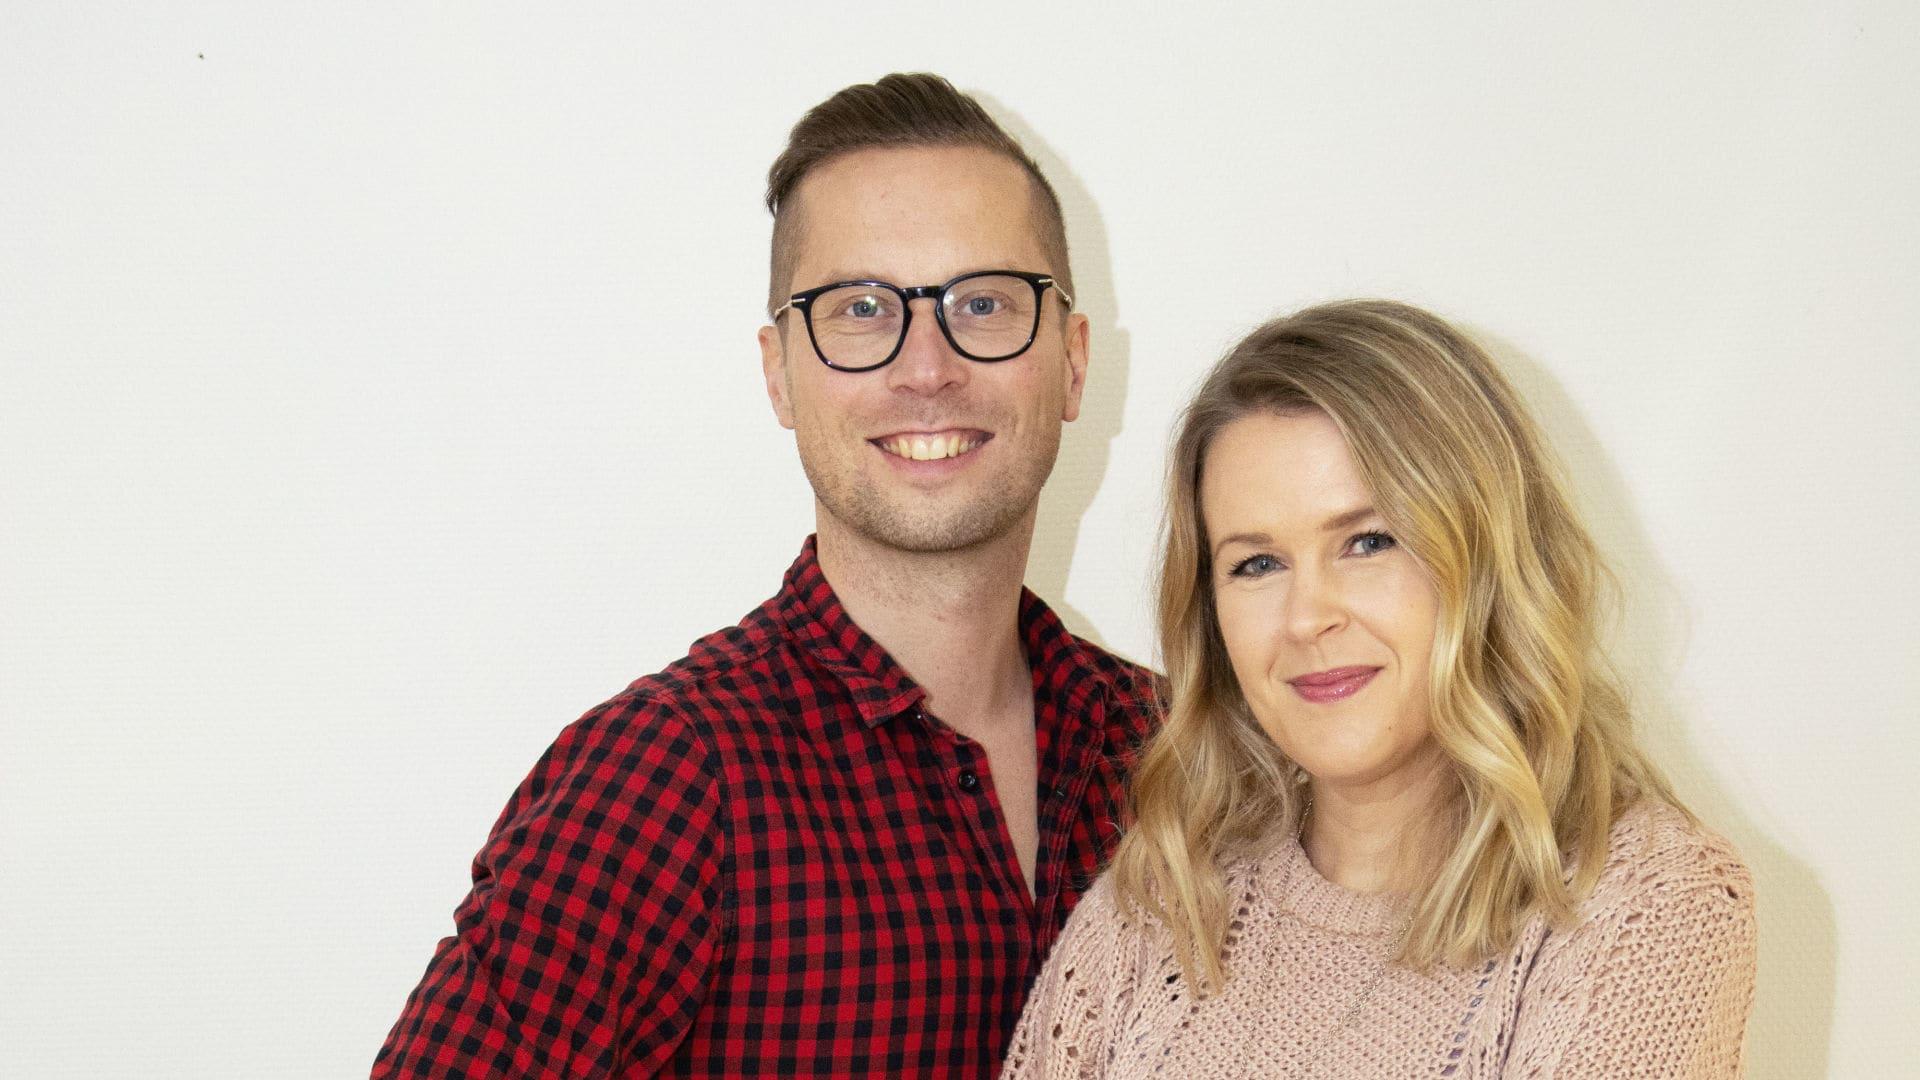 killar med glasögon dating